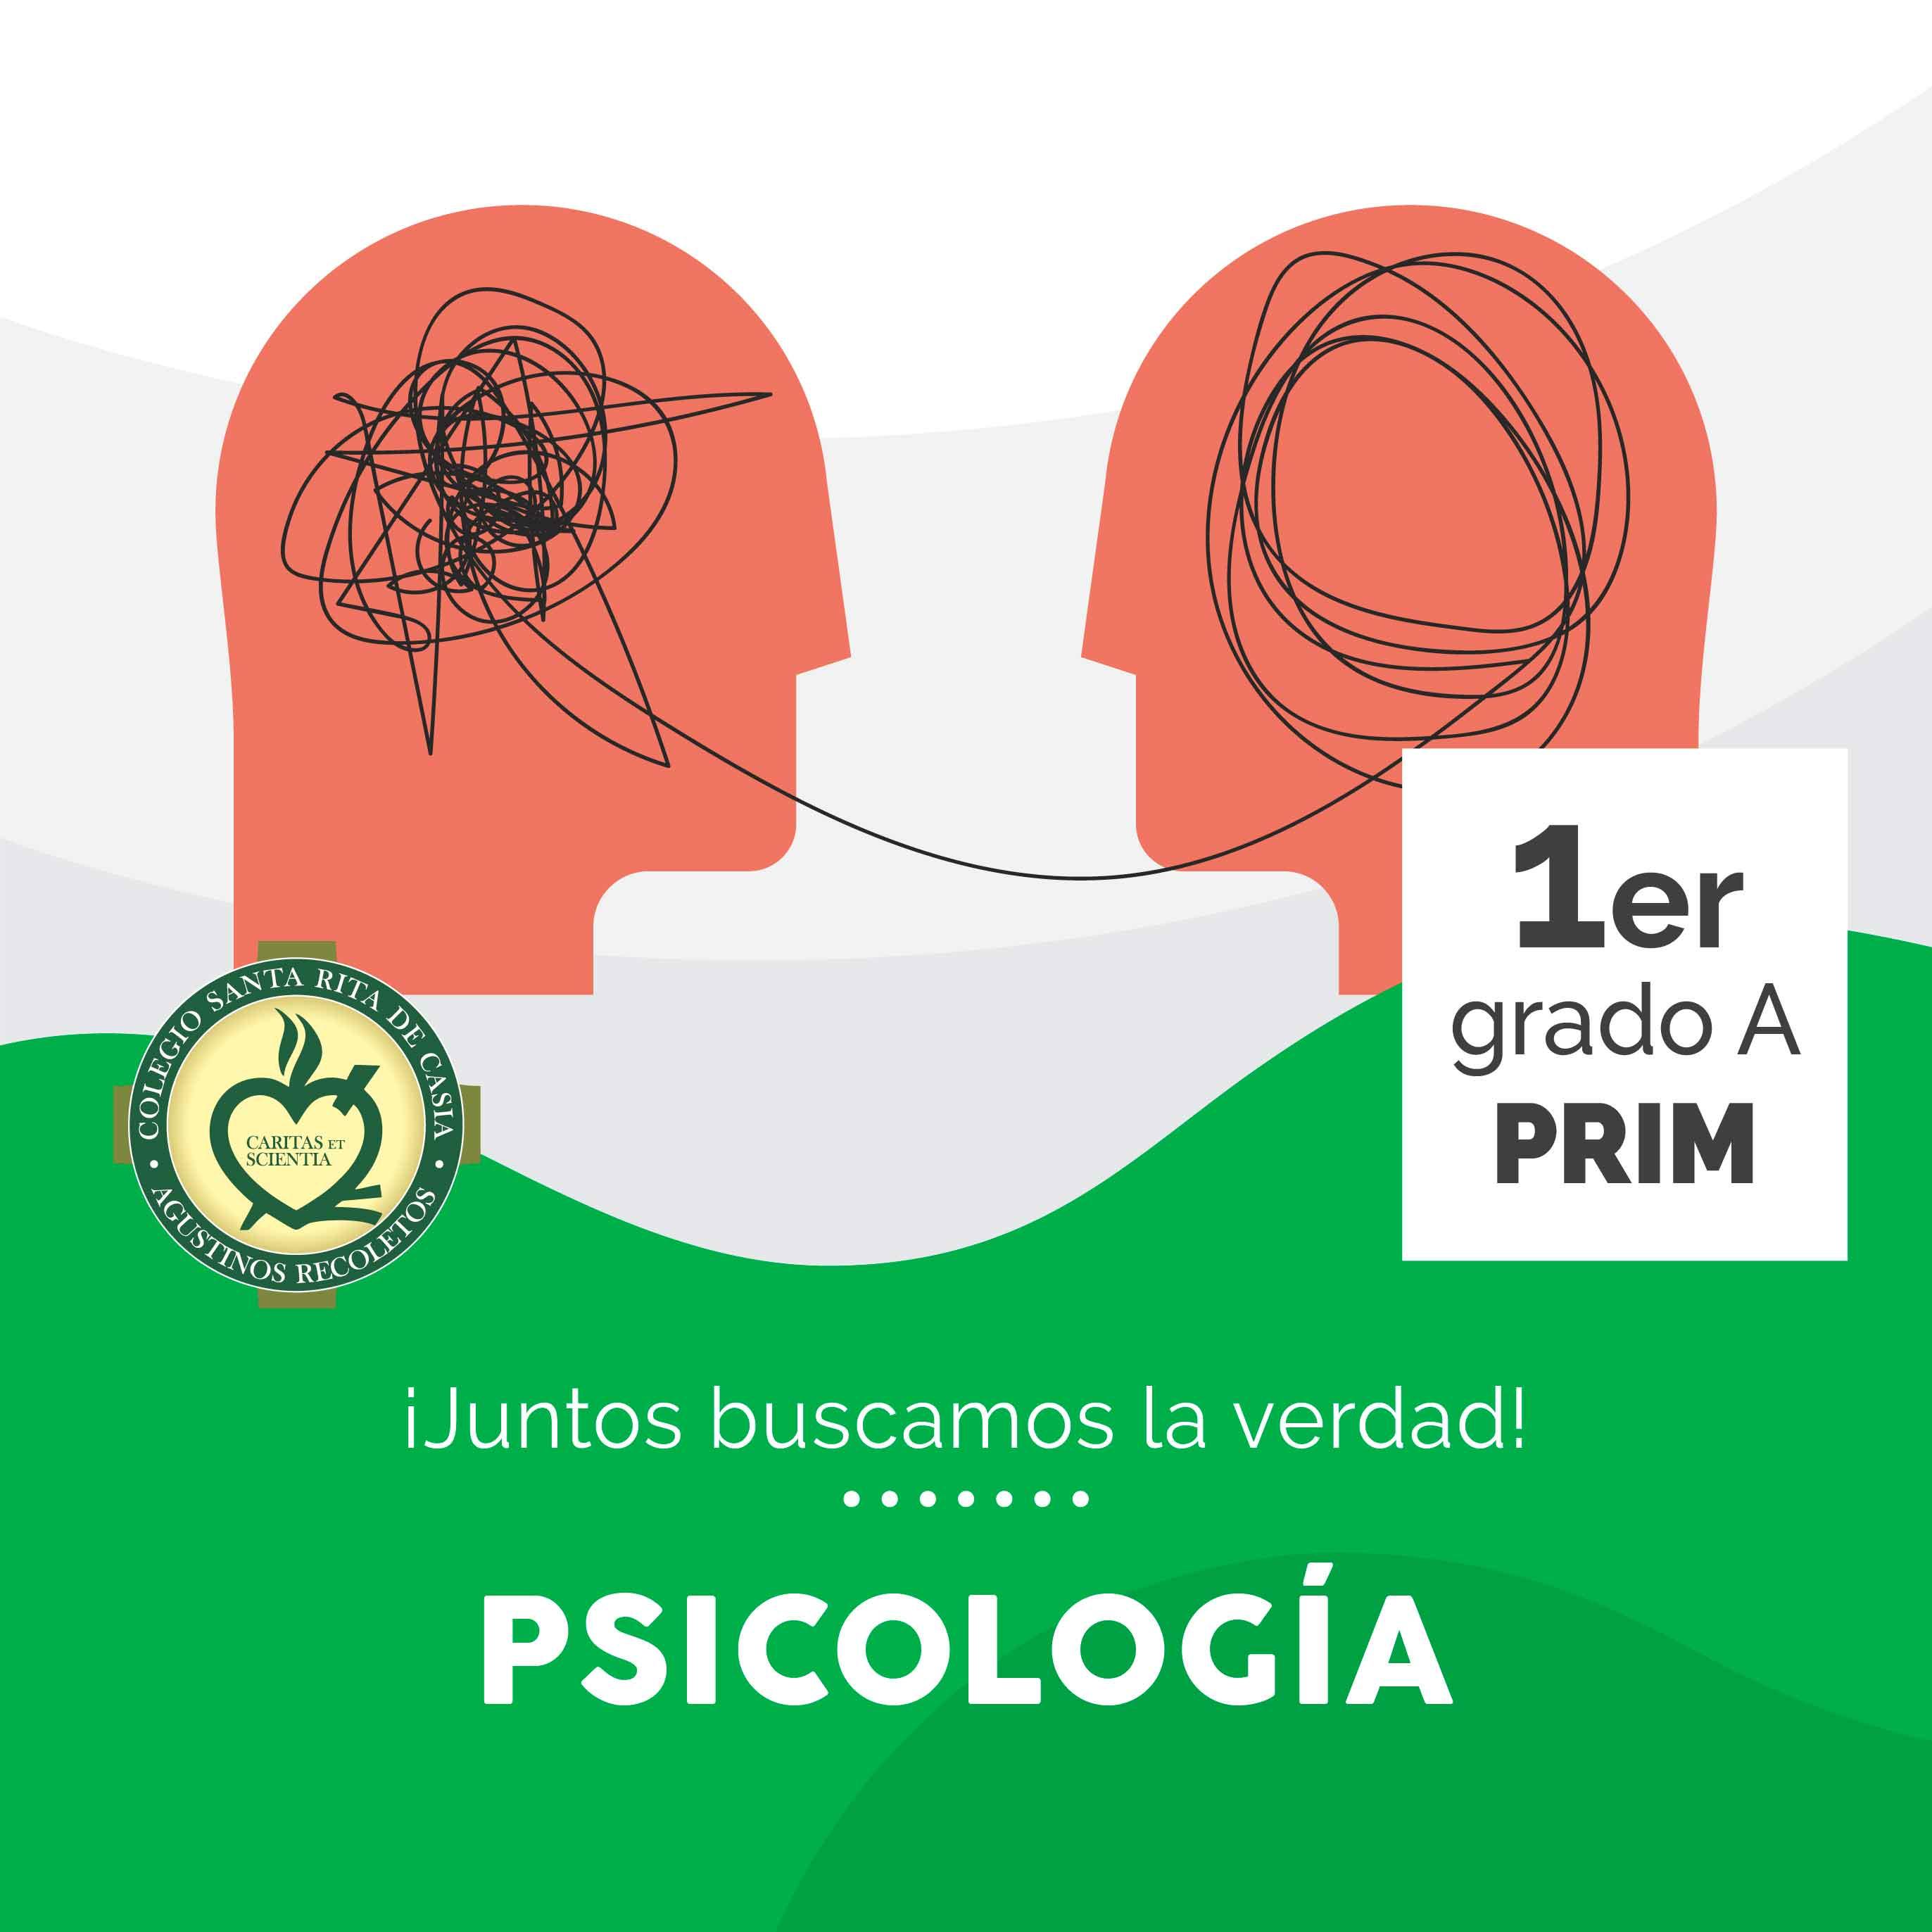 Psicología 1er Grado A